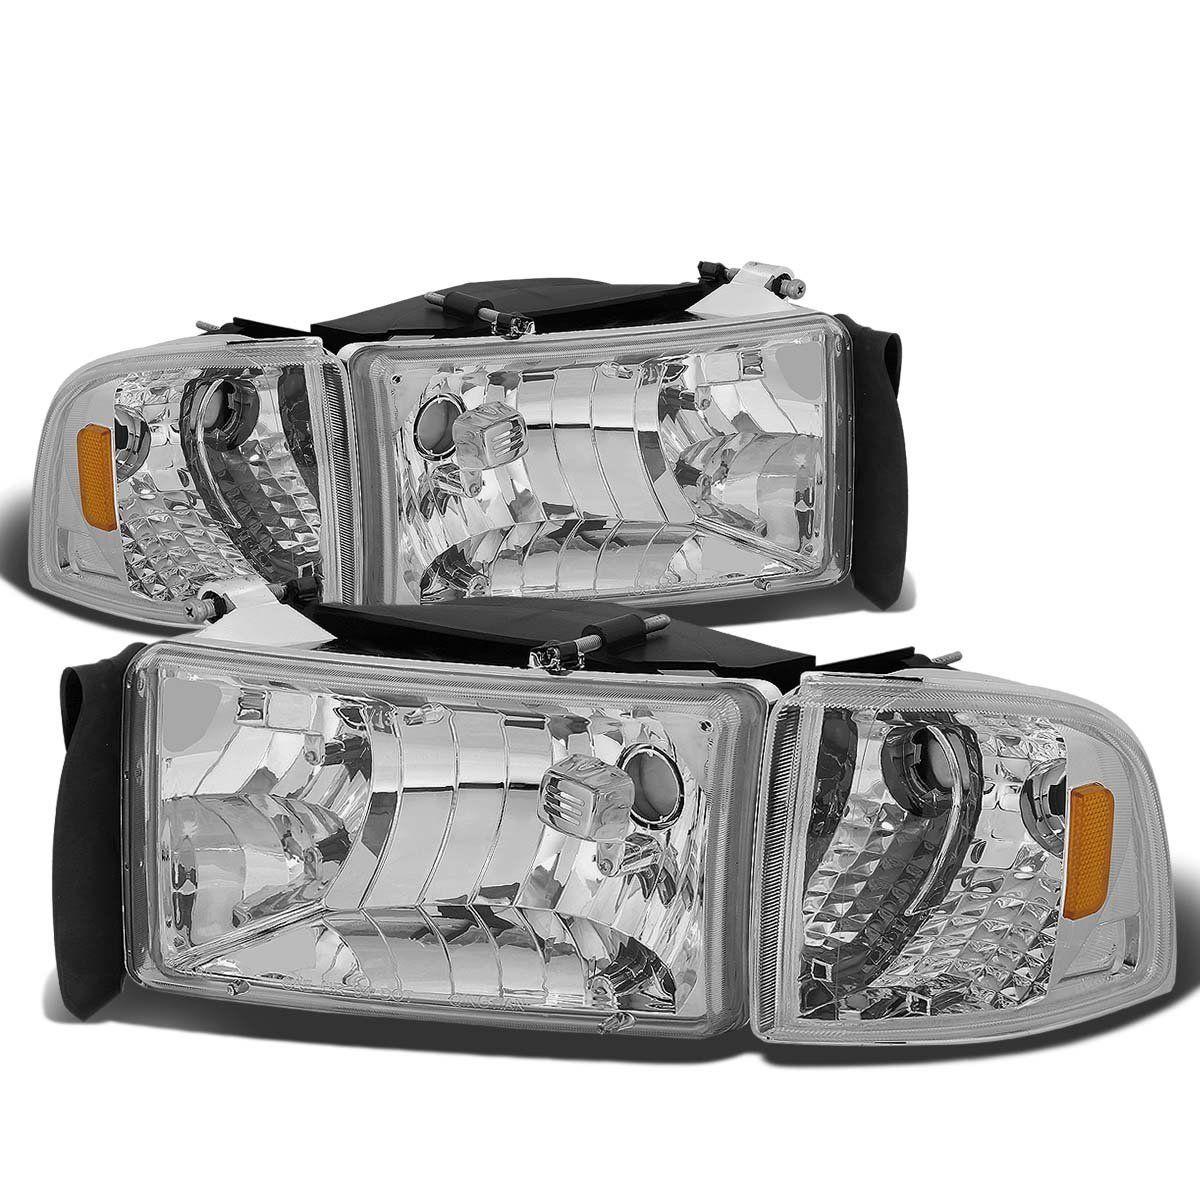 94 01 Dodge Ram 1500 2500 3500 Oem Style Crystal Headlights Chrome Dodge Ram Aftermarket Headlights Dodge Ram 1500